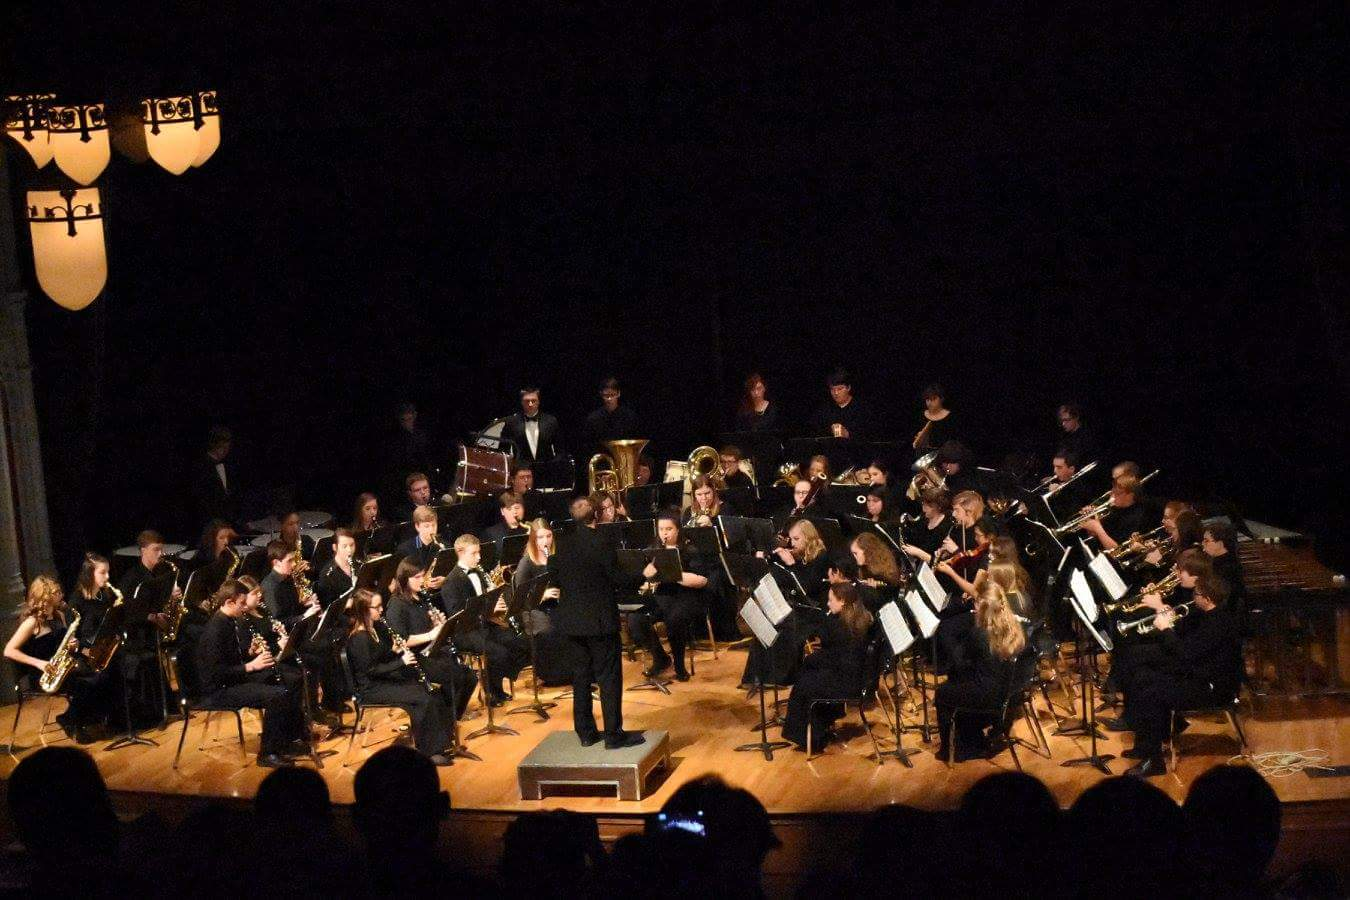 concertband.jpg